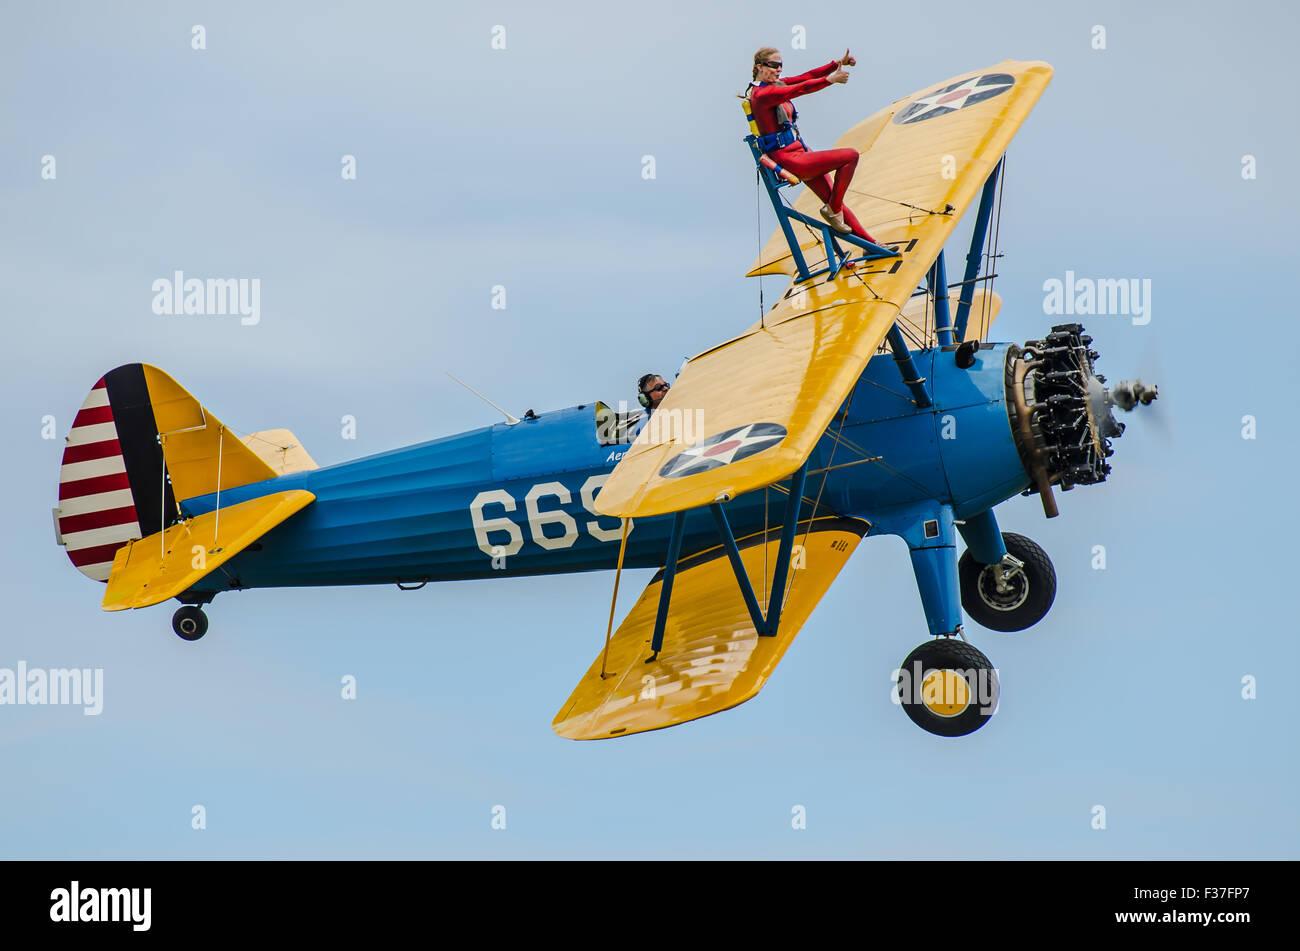 emma-stewart-rigby-wing-walking-atop-a-boeing-stearman-biplane-plane-F37FP7.jpg